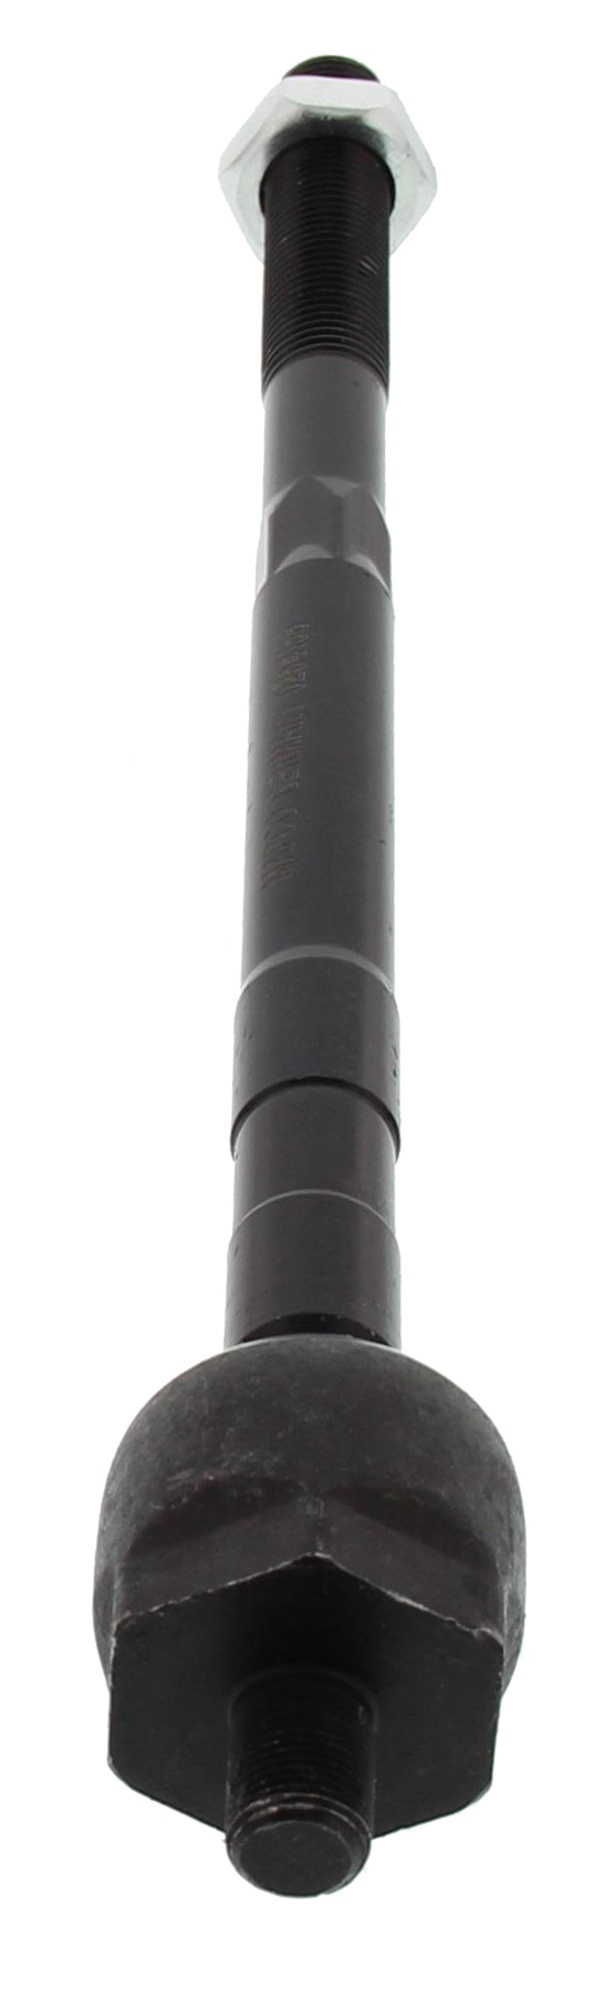 MAPCO 49155 inner tie rod end